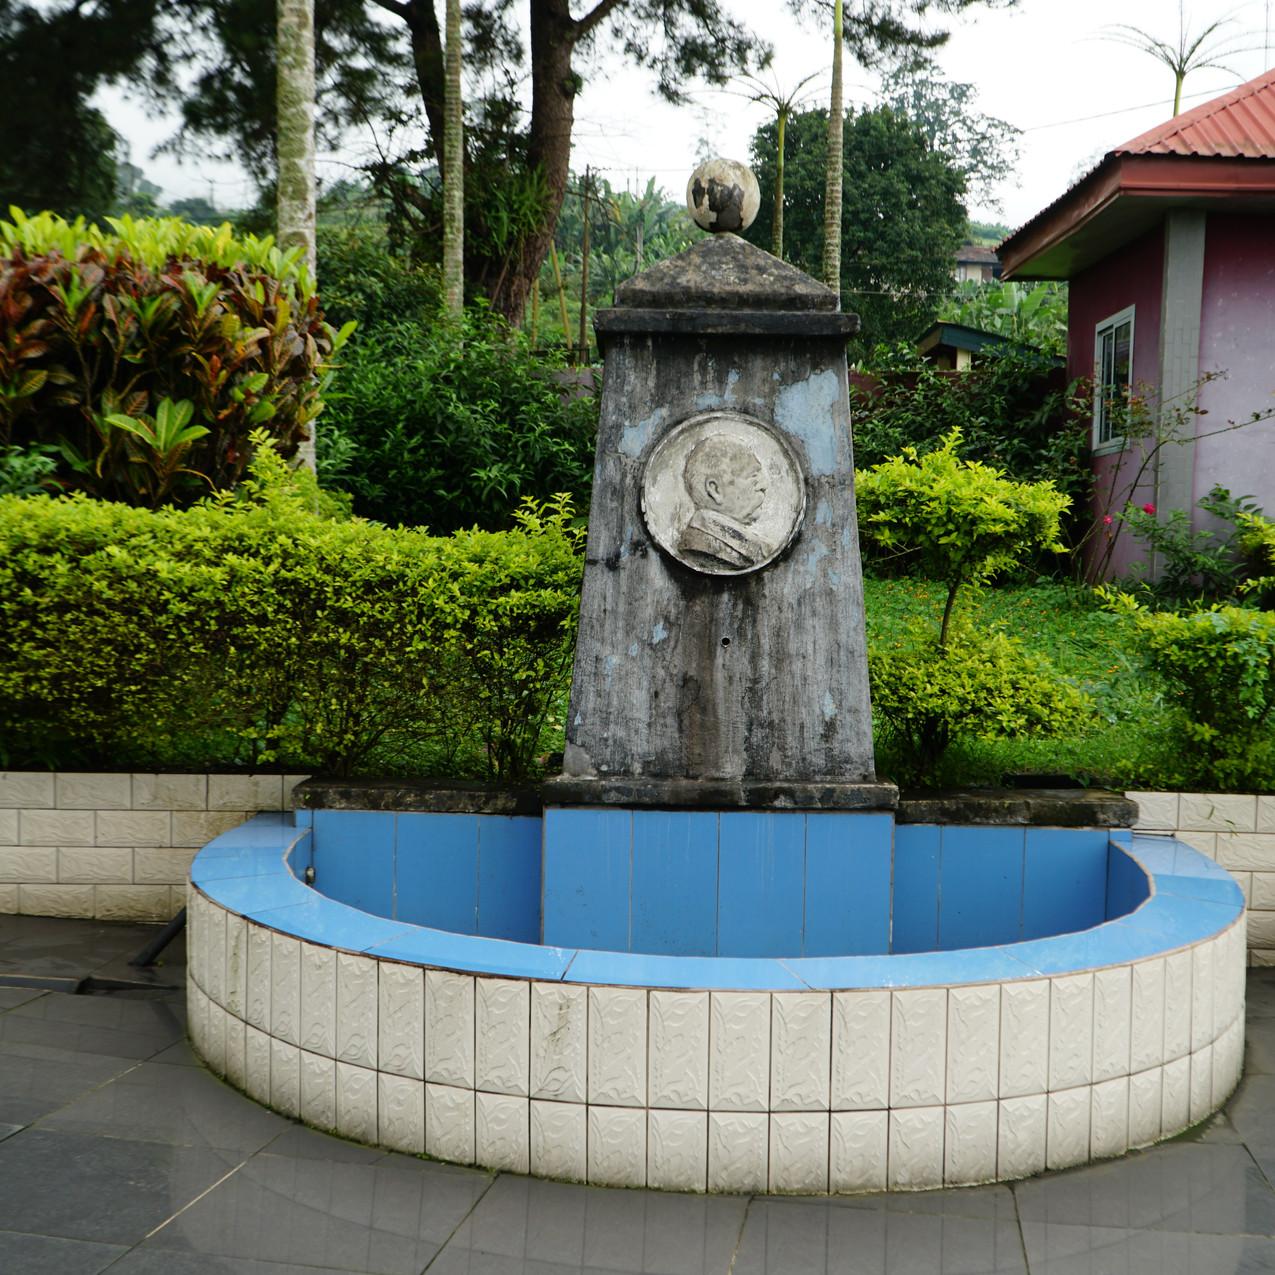 Bismarck Fountain